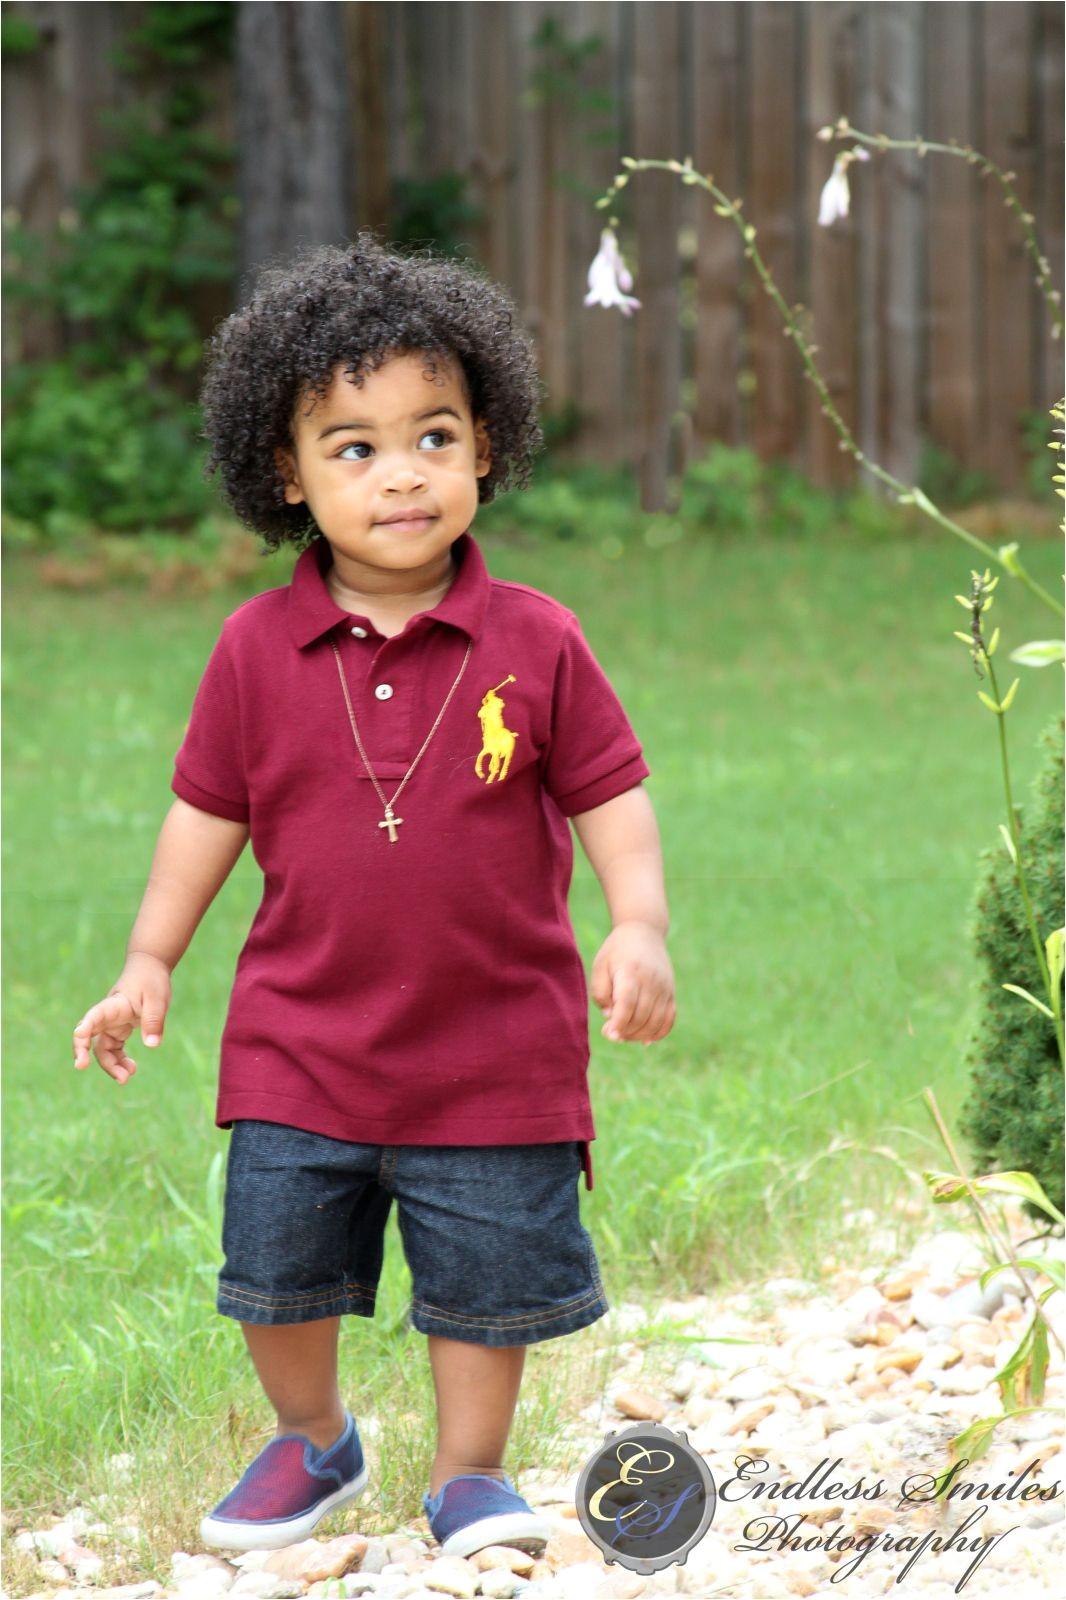 Toddler Boy Curly Hairstyles Enjoying the Summer Sun Natural Curly Boys Hair Pinterest